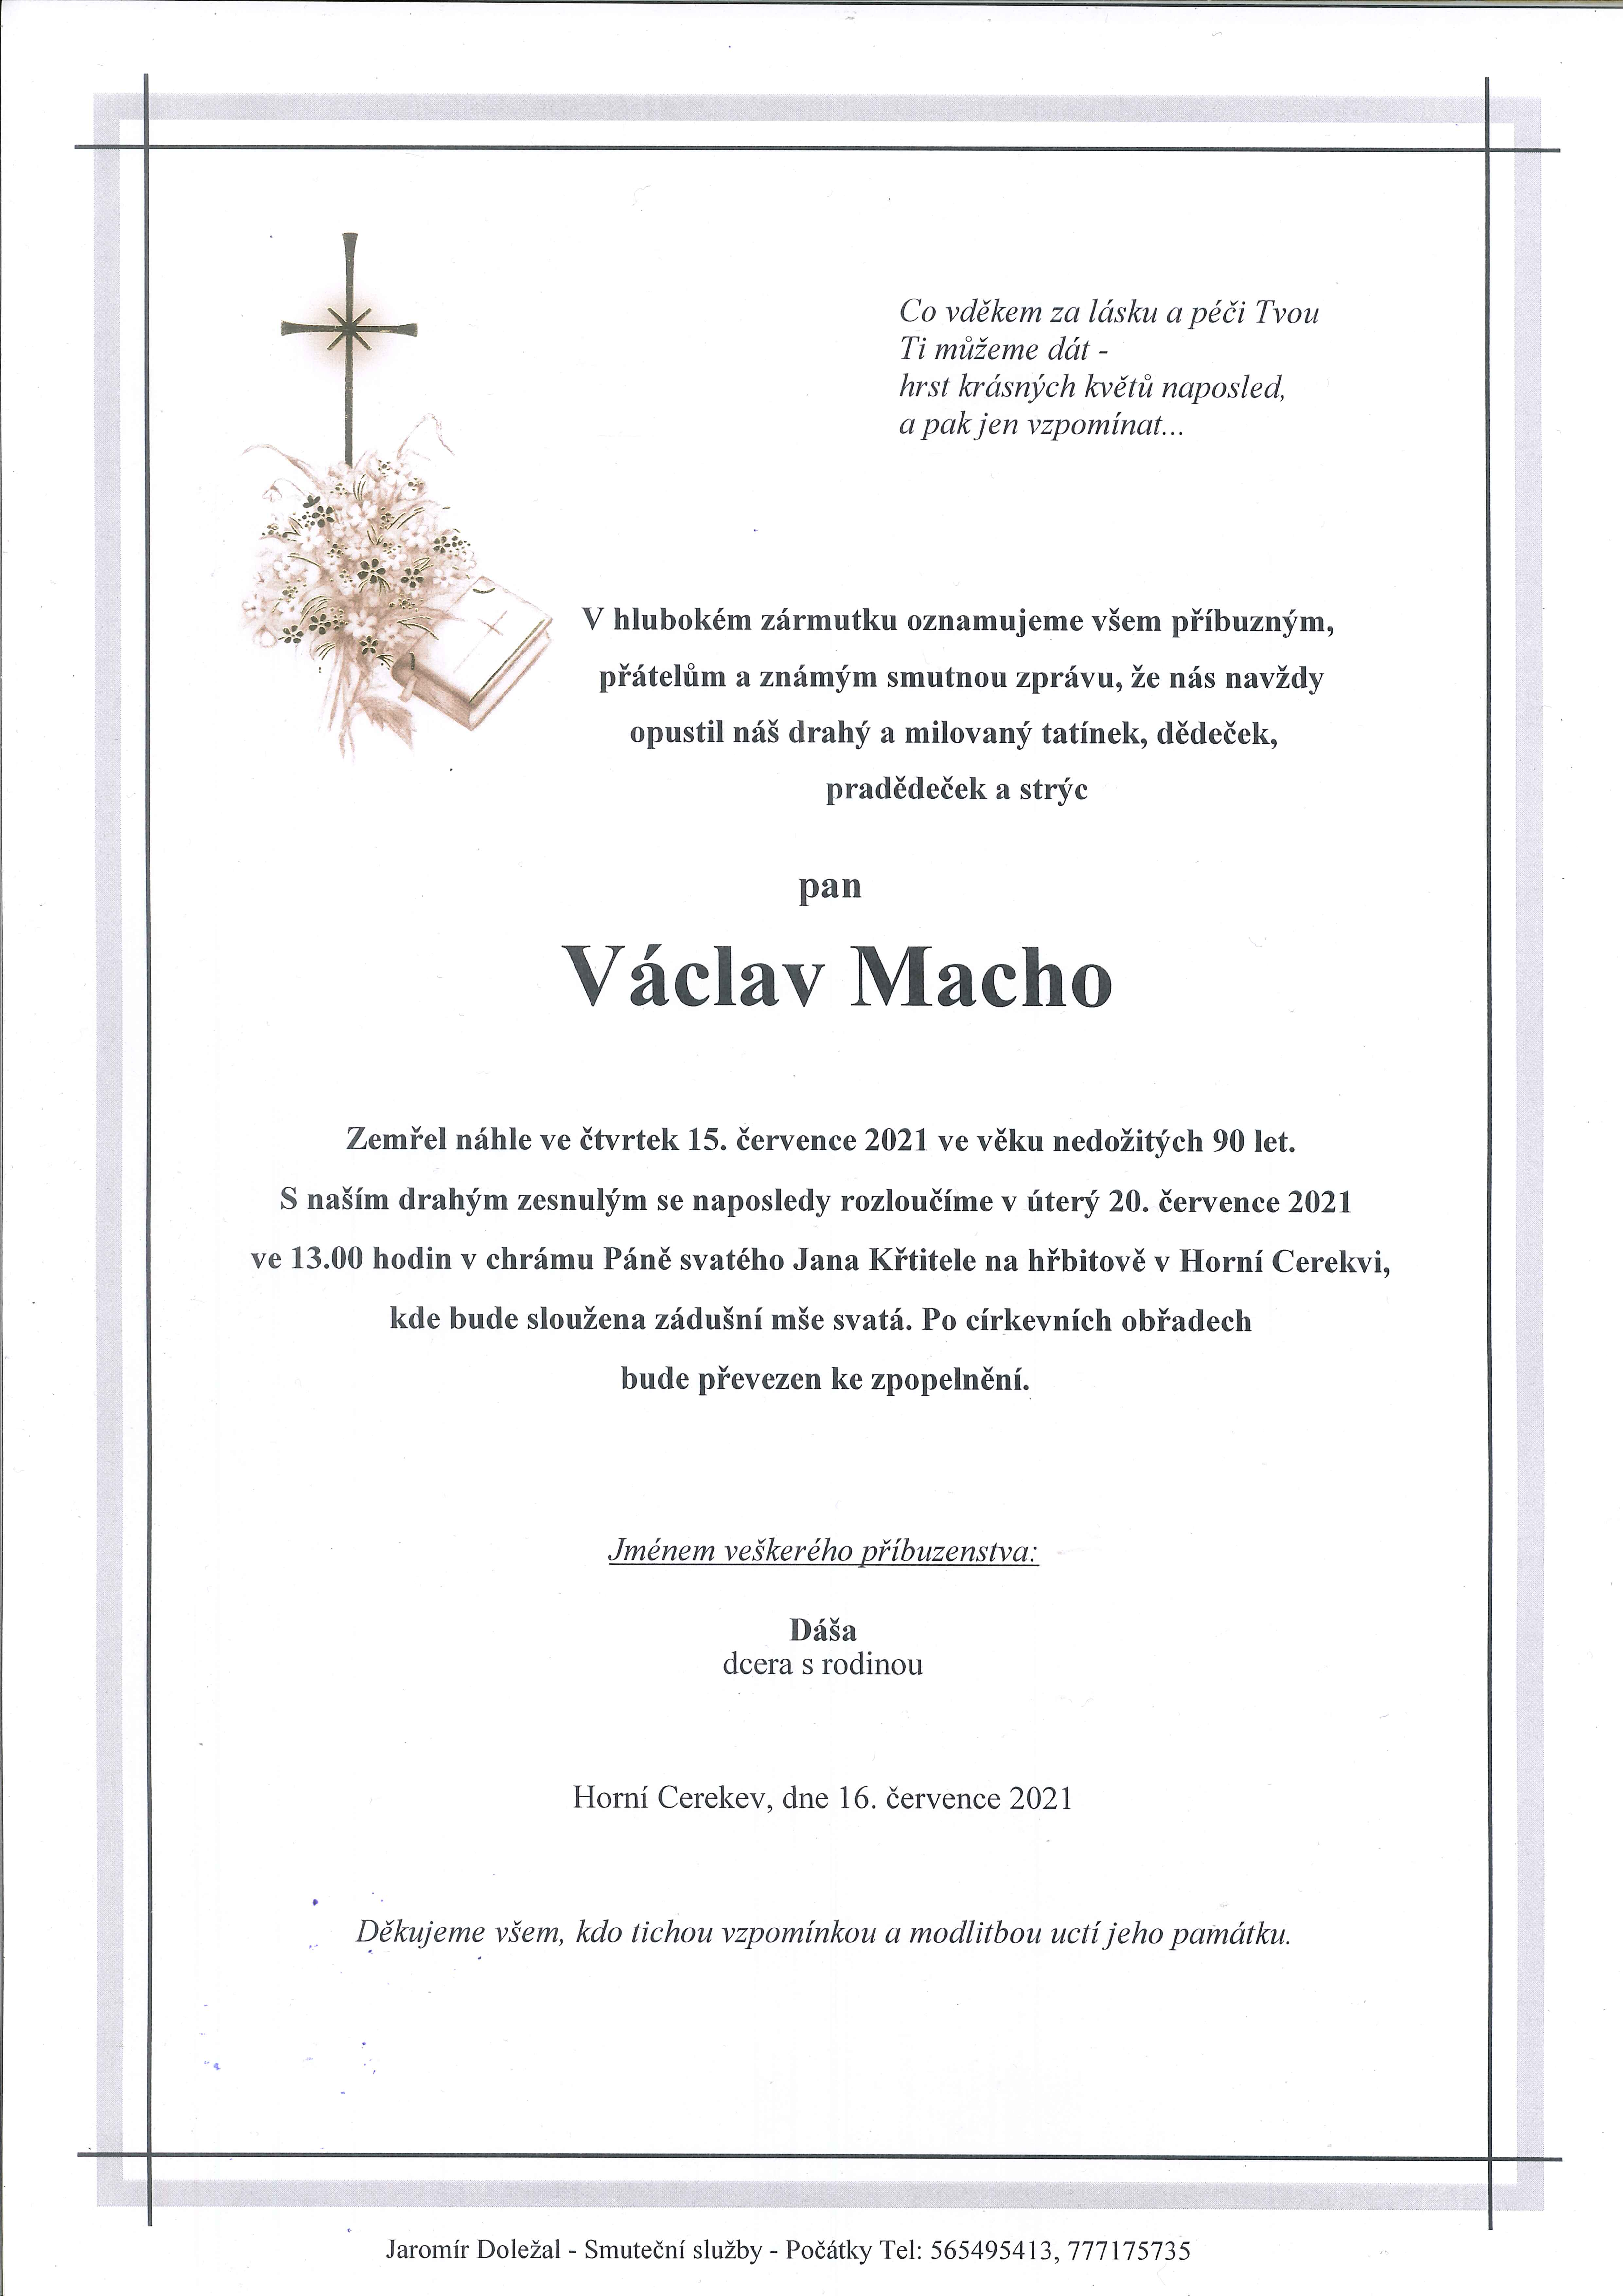 Václav Macho